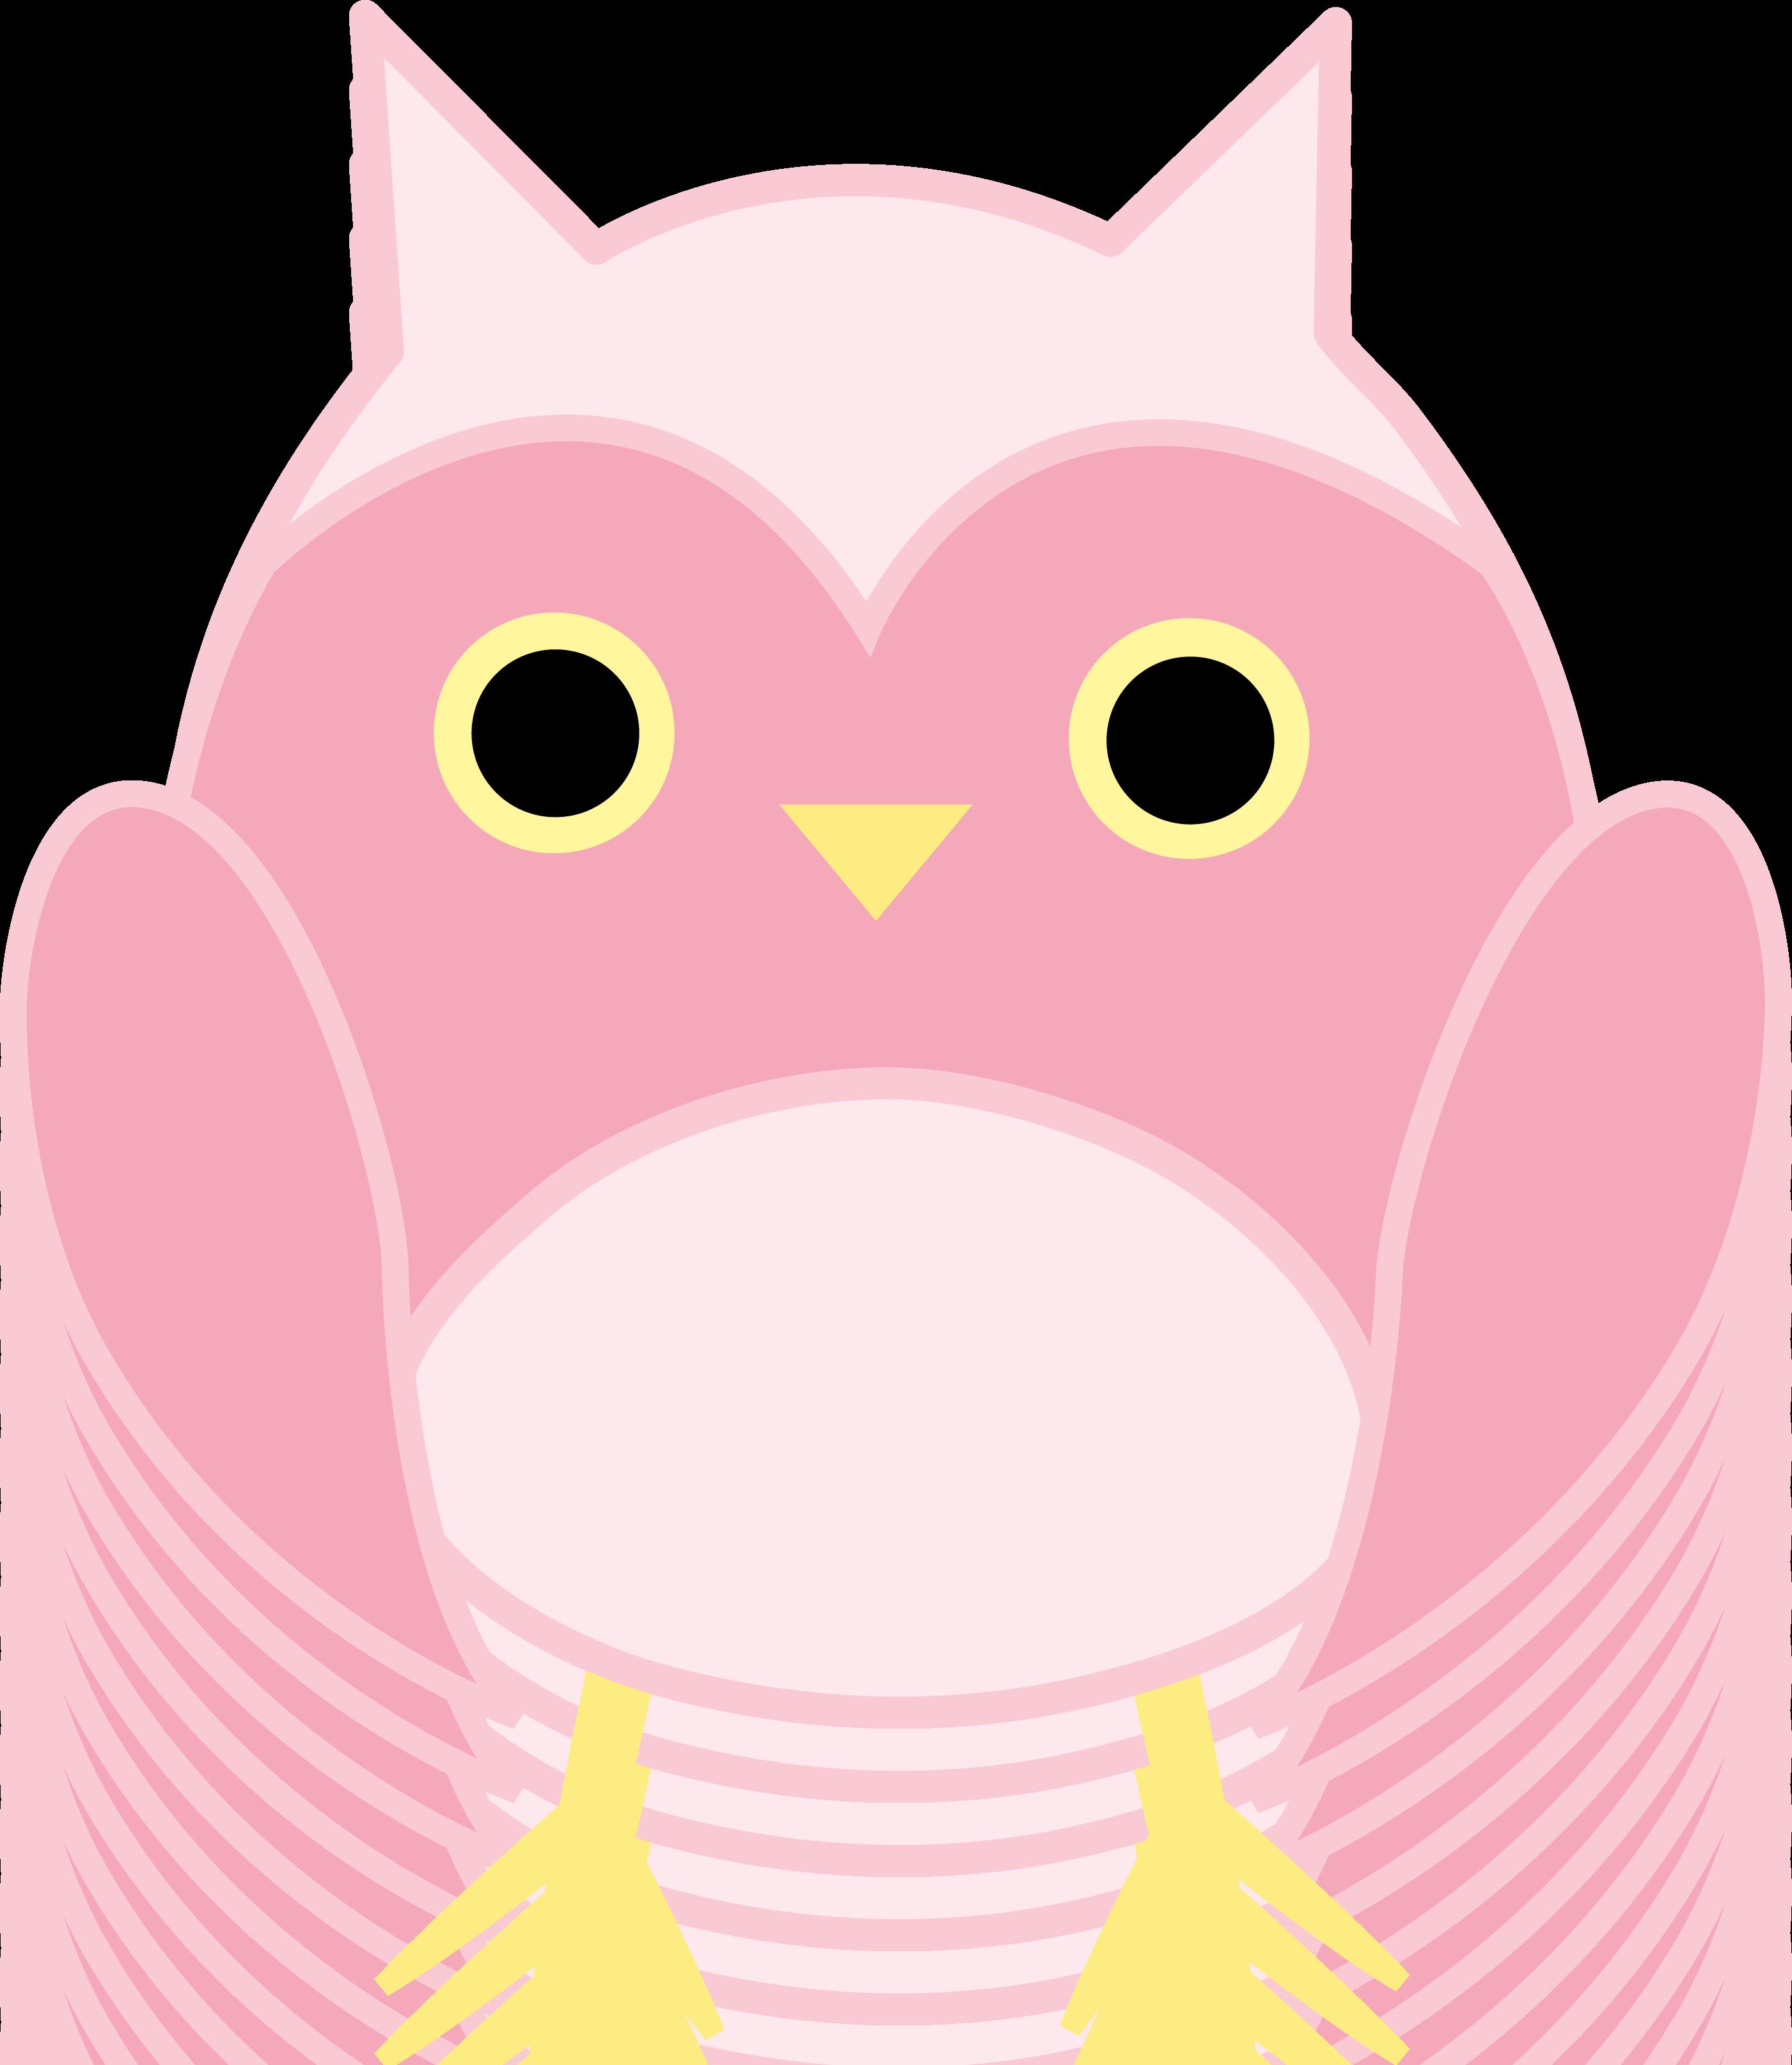 2802x3228 Cute Pink Owl